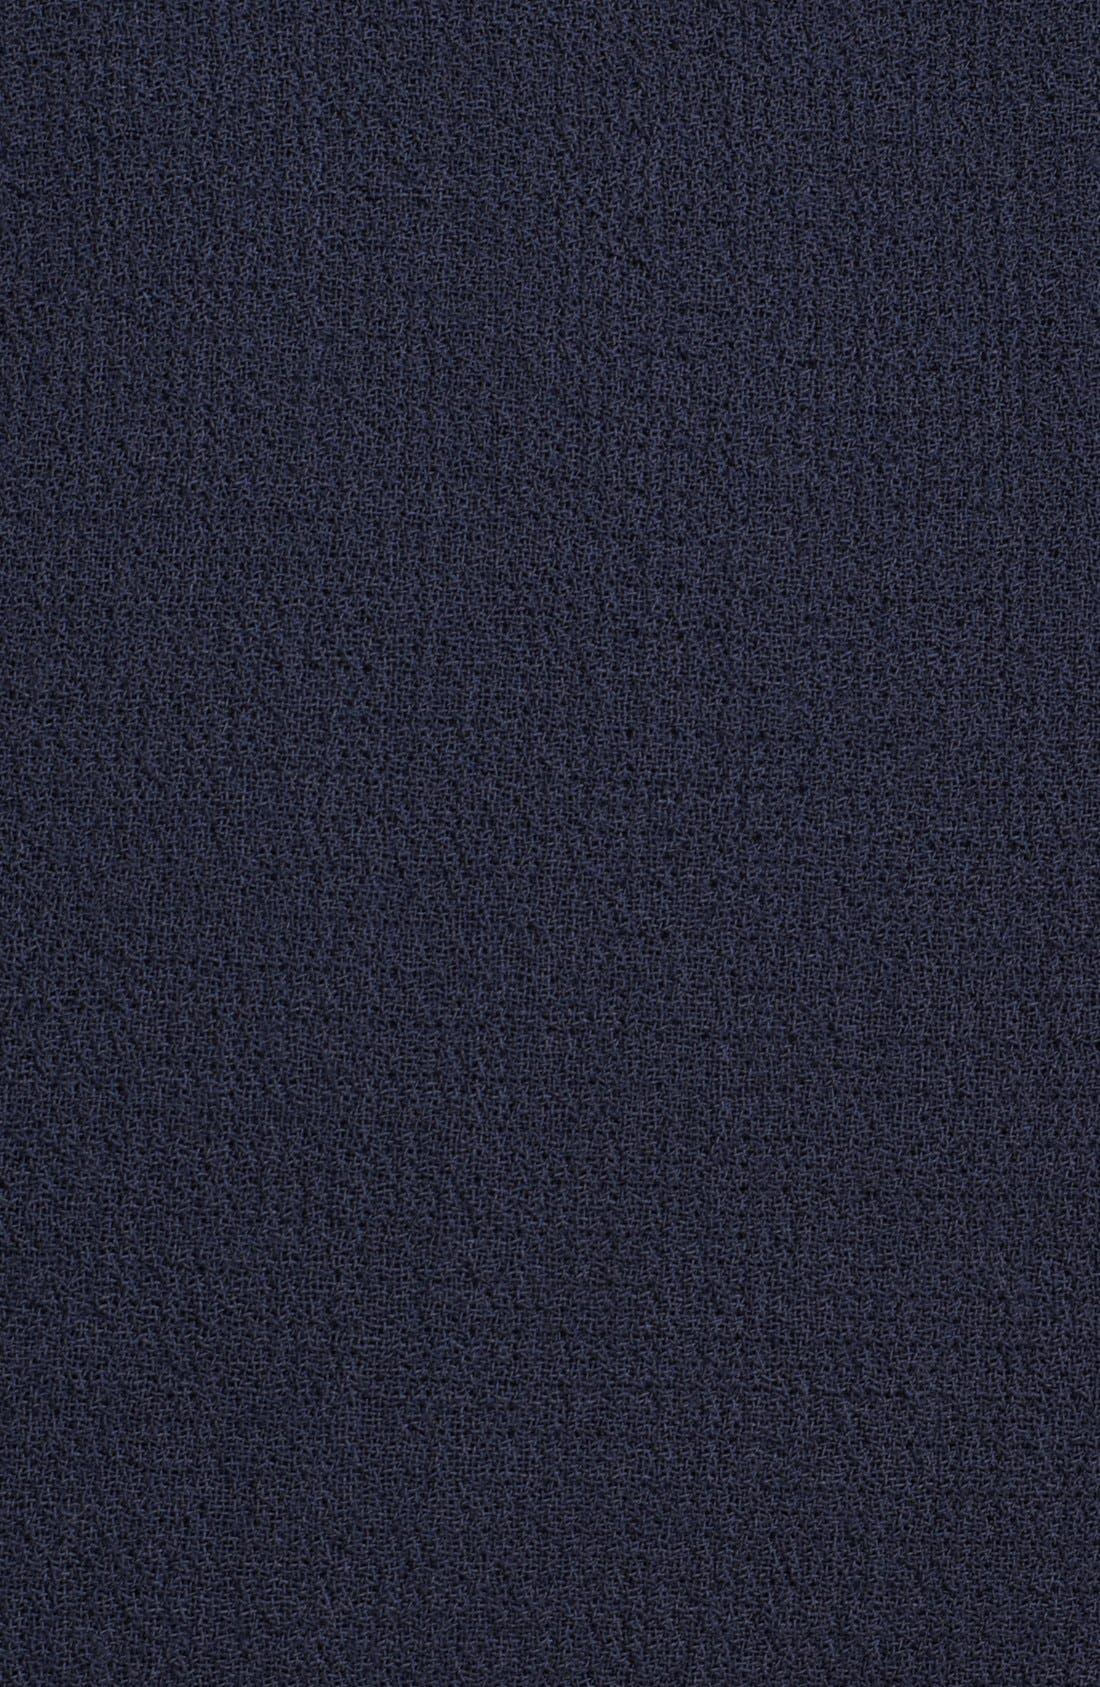 Alternate Image 3  - Armani Collezioni Gabardine Pencil Skirt